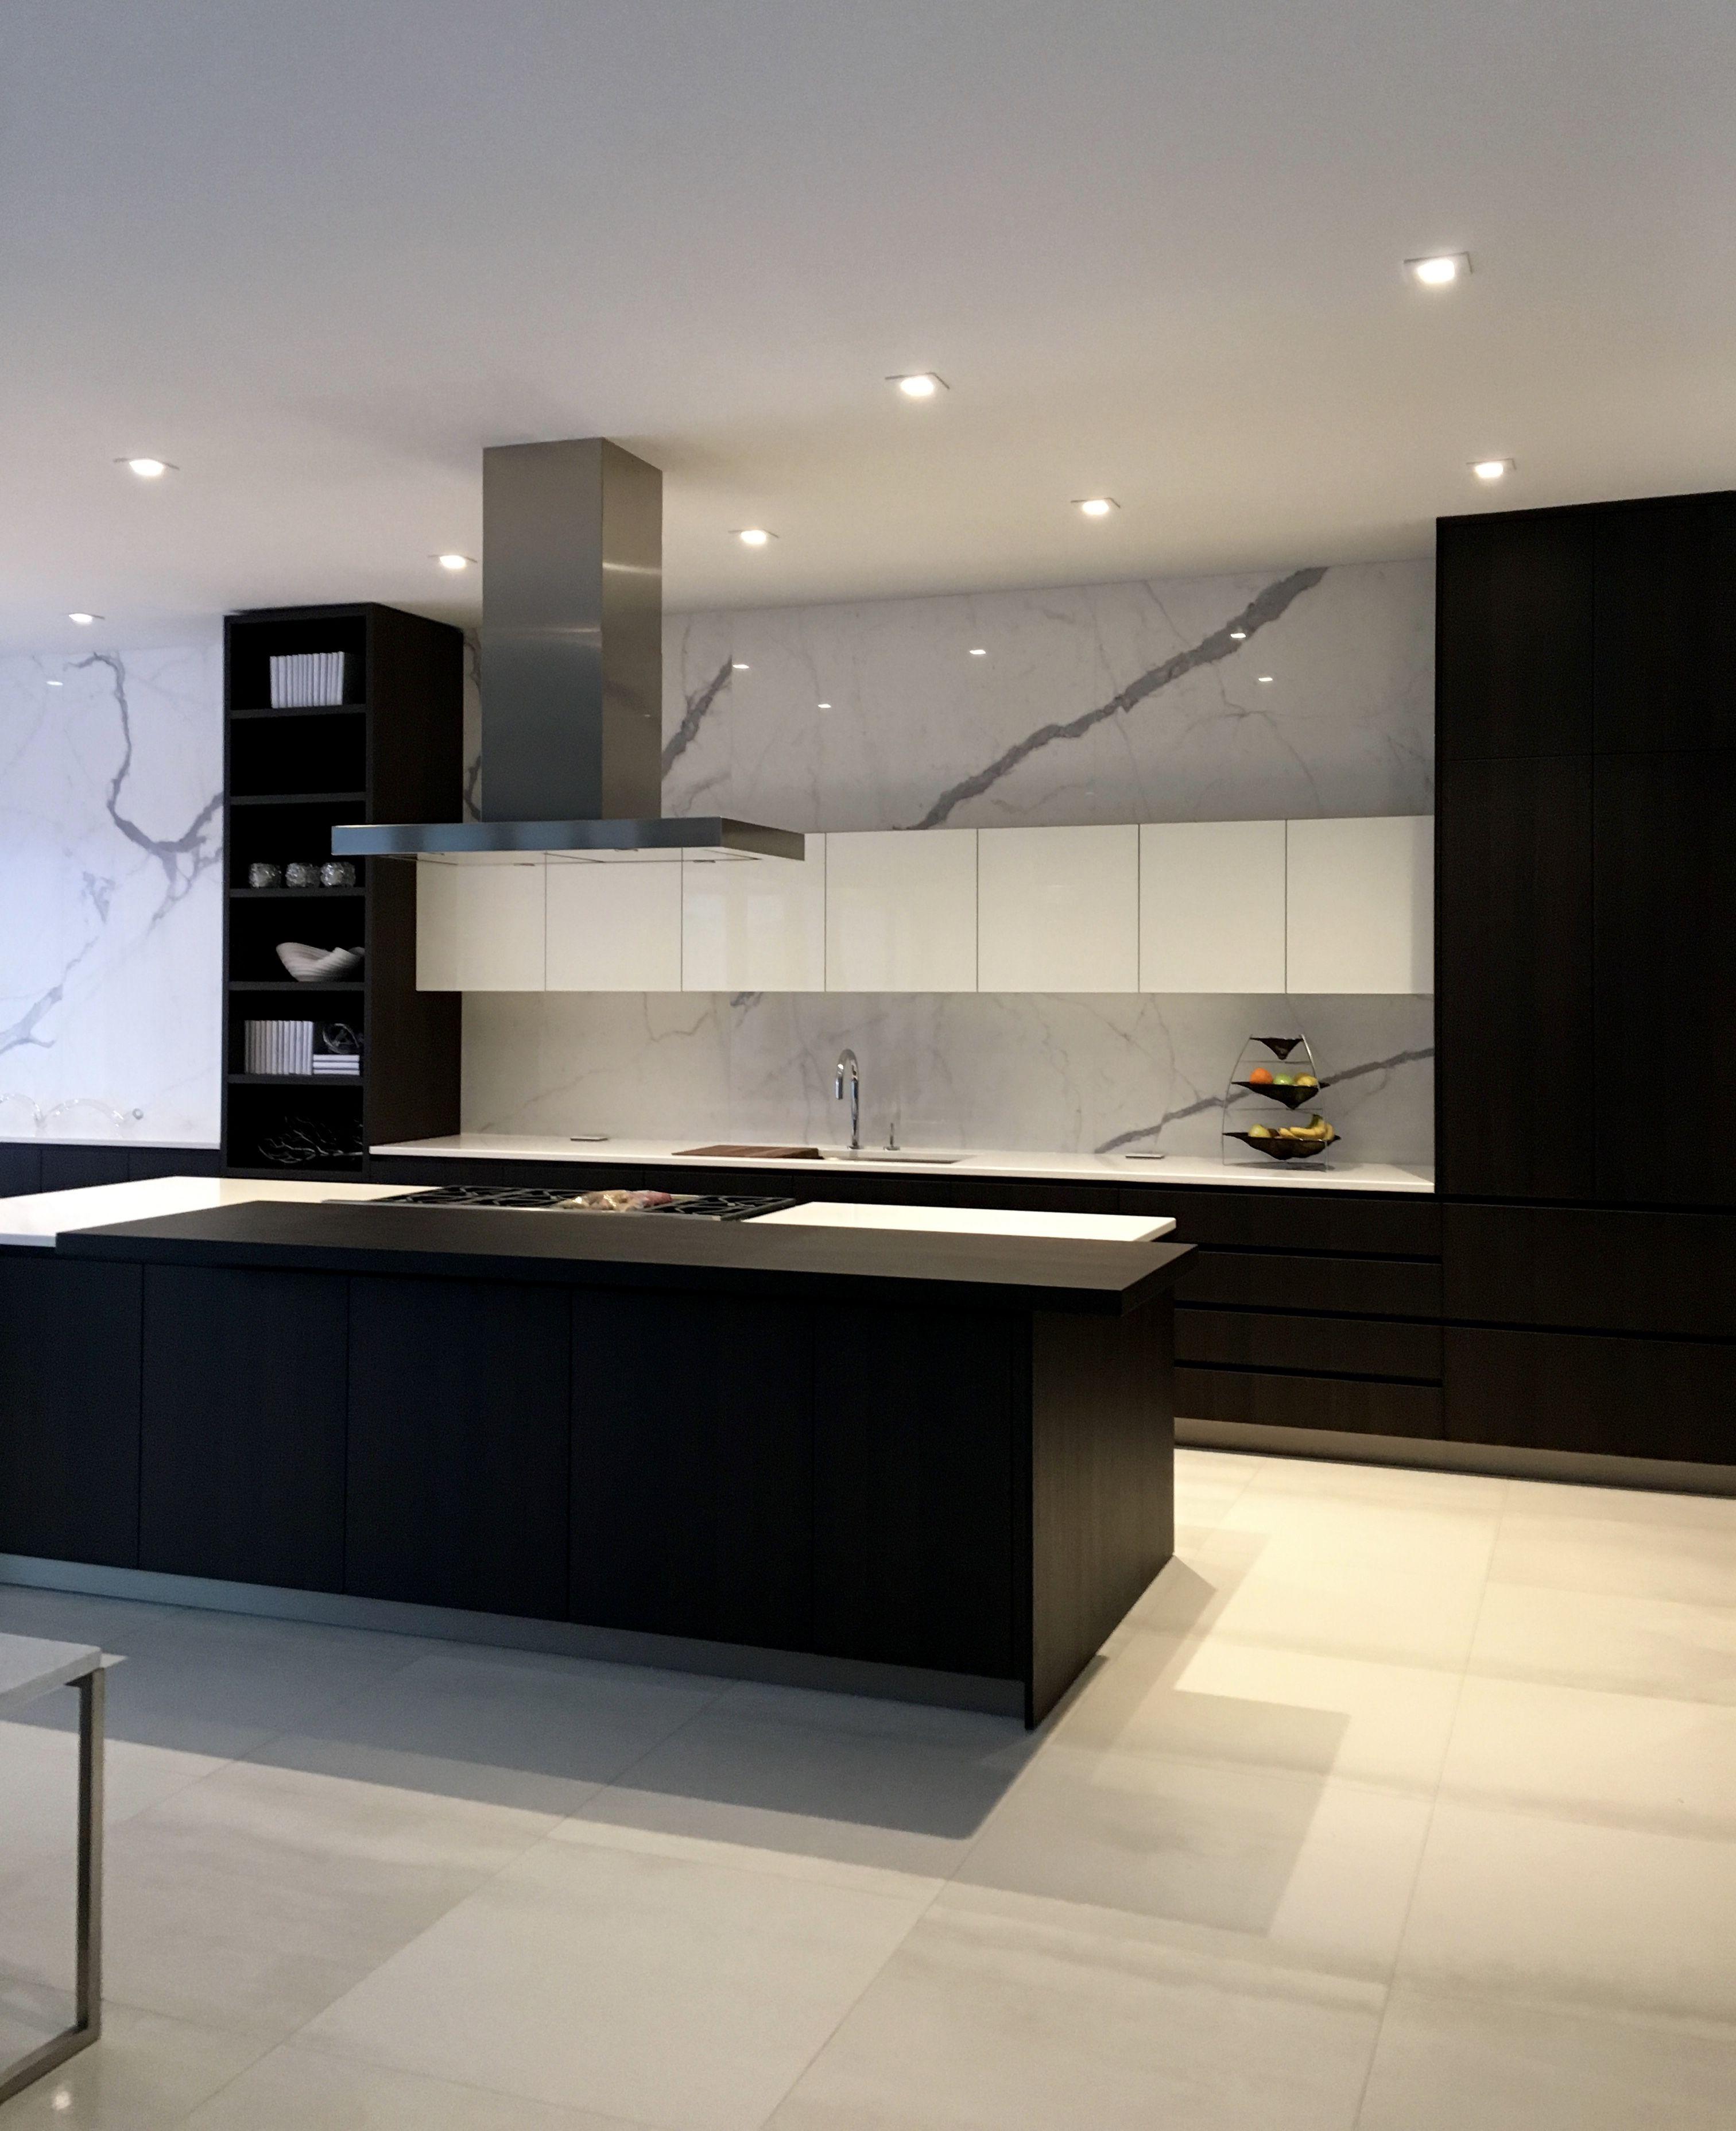 new trade hawthorne at interior mark nj collection ravishing plan apartment trends kitchen design ideas build